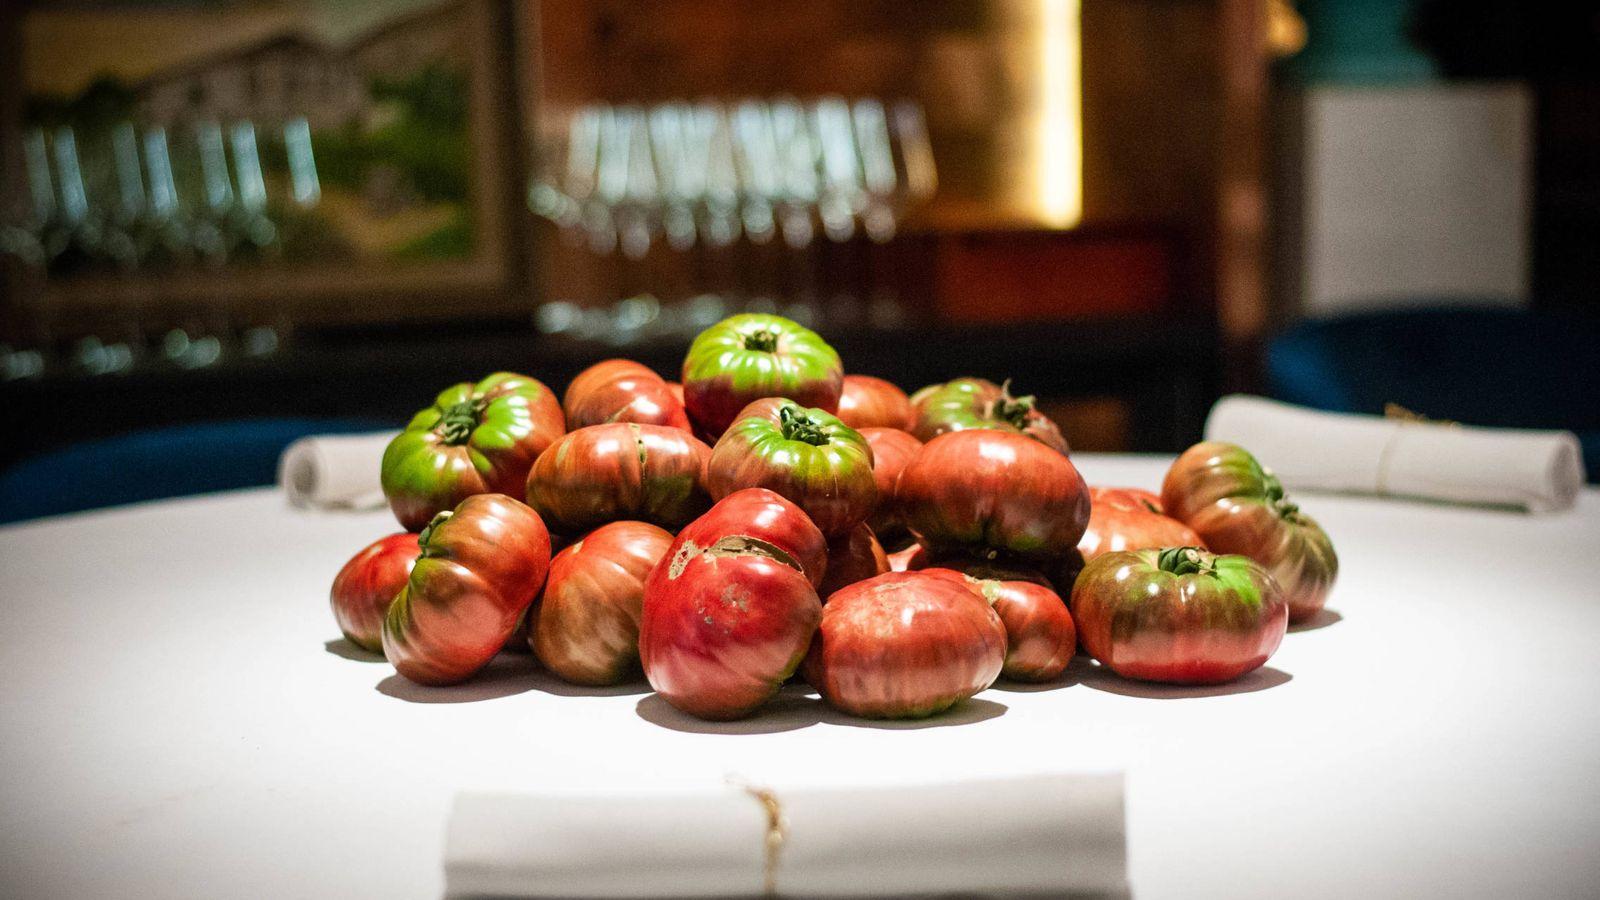 Foto: Los tomates de la Huerta de Carabaña. (Foto: Carmen Castellón)